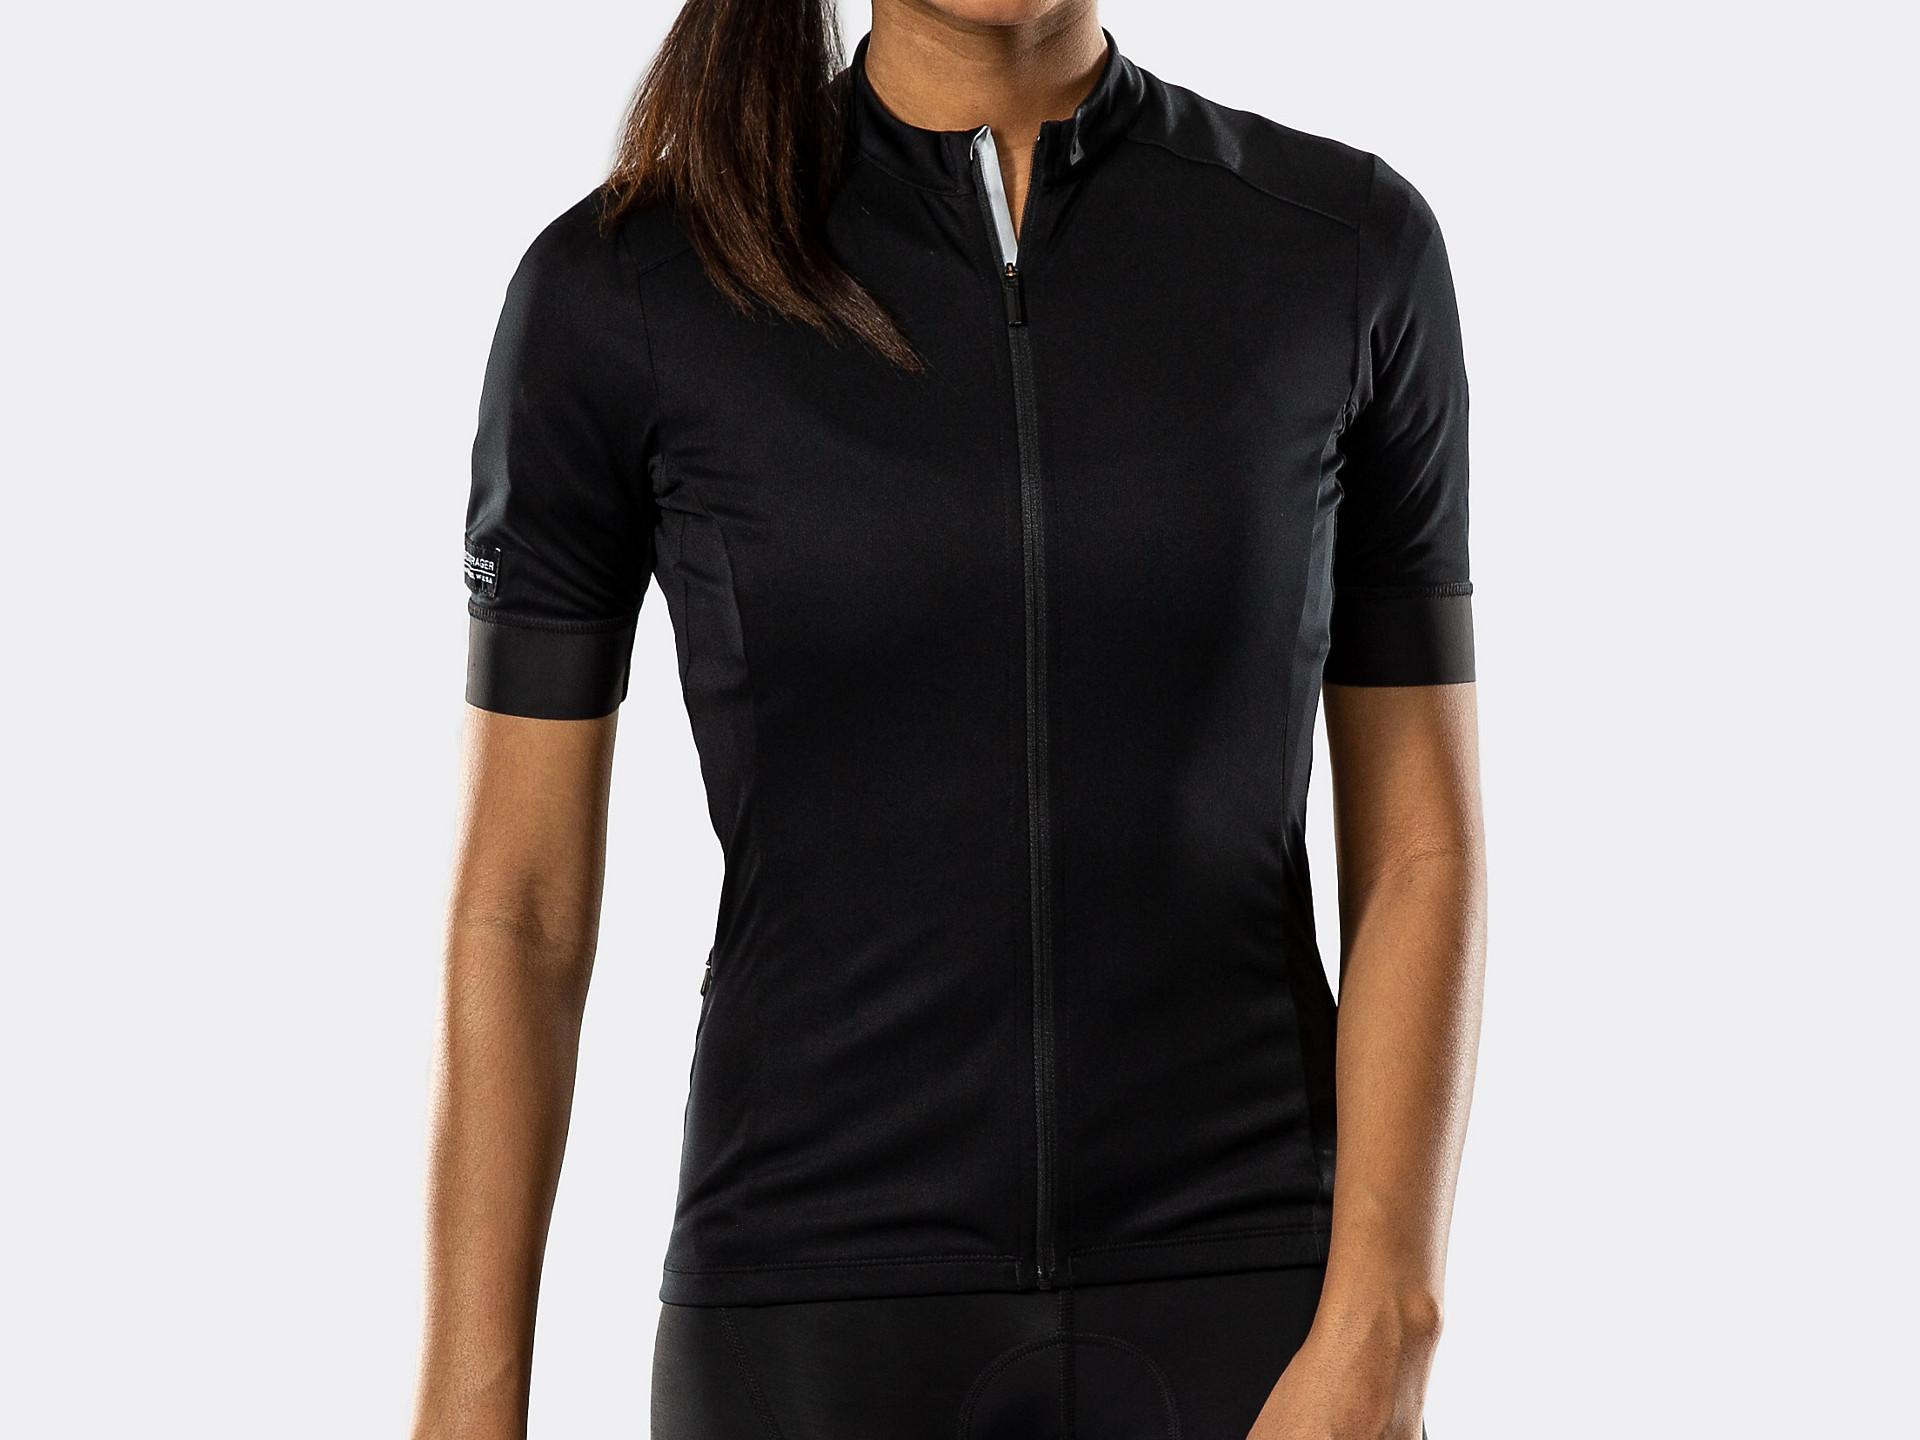 Bontrager Meraj Women s Cycling Jersey 82e83b4c6